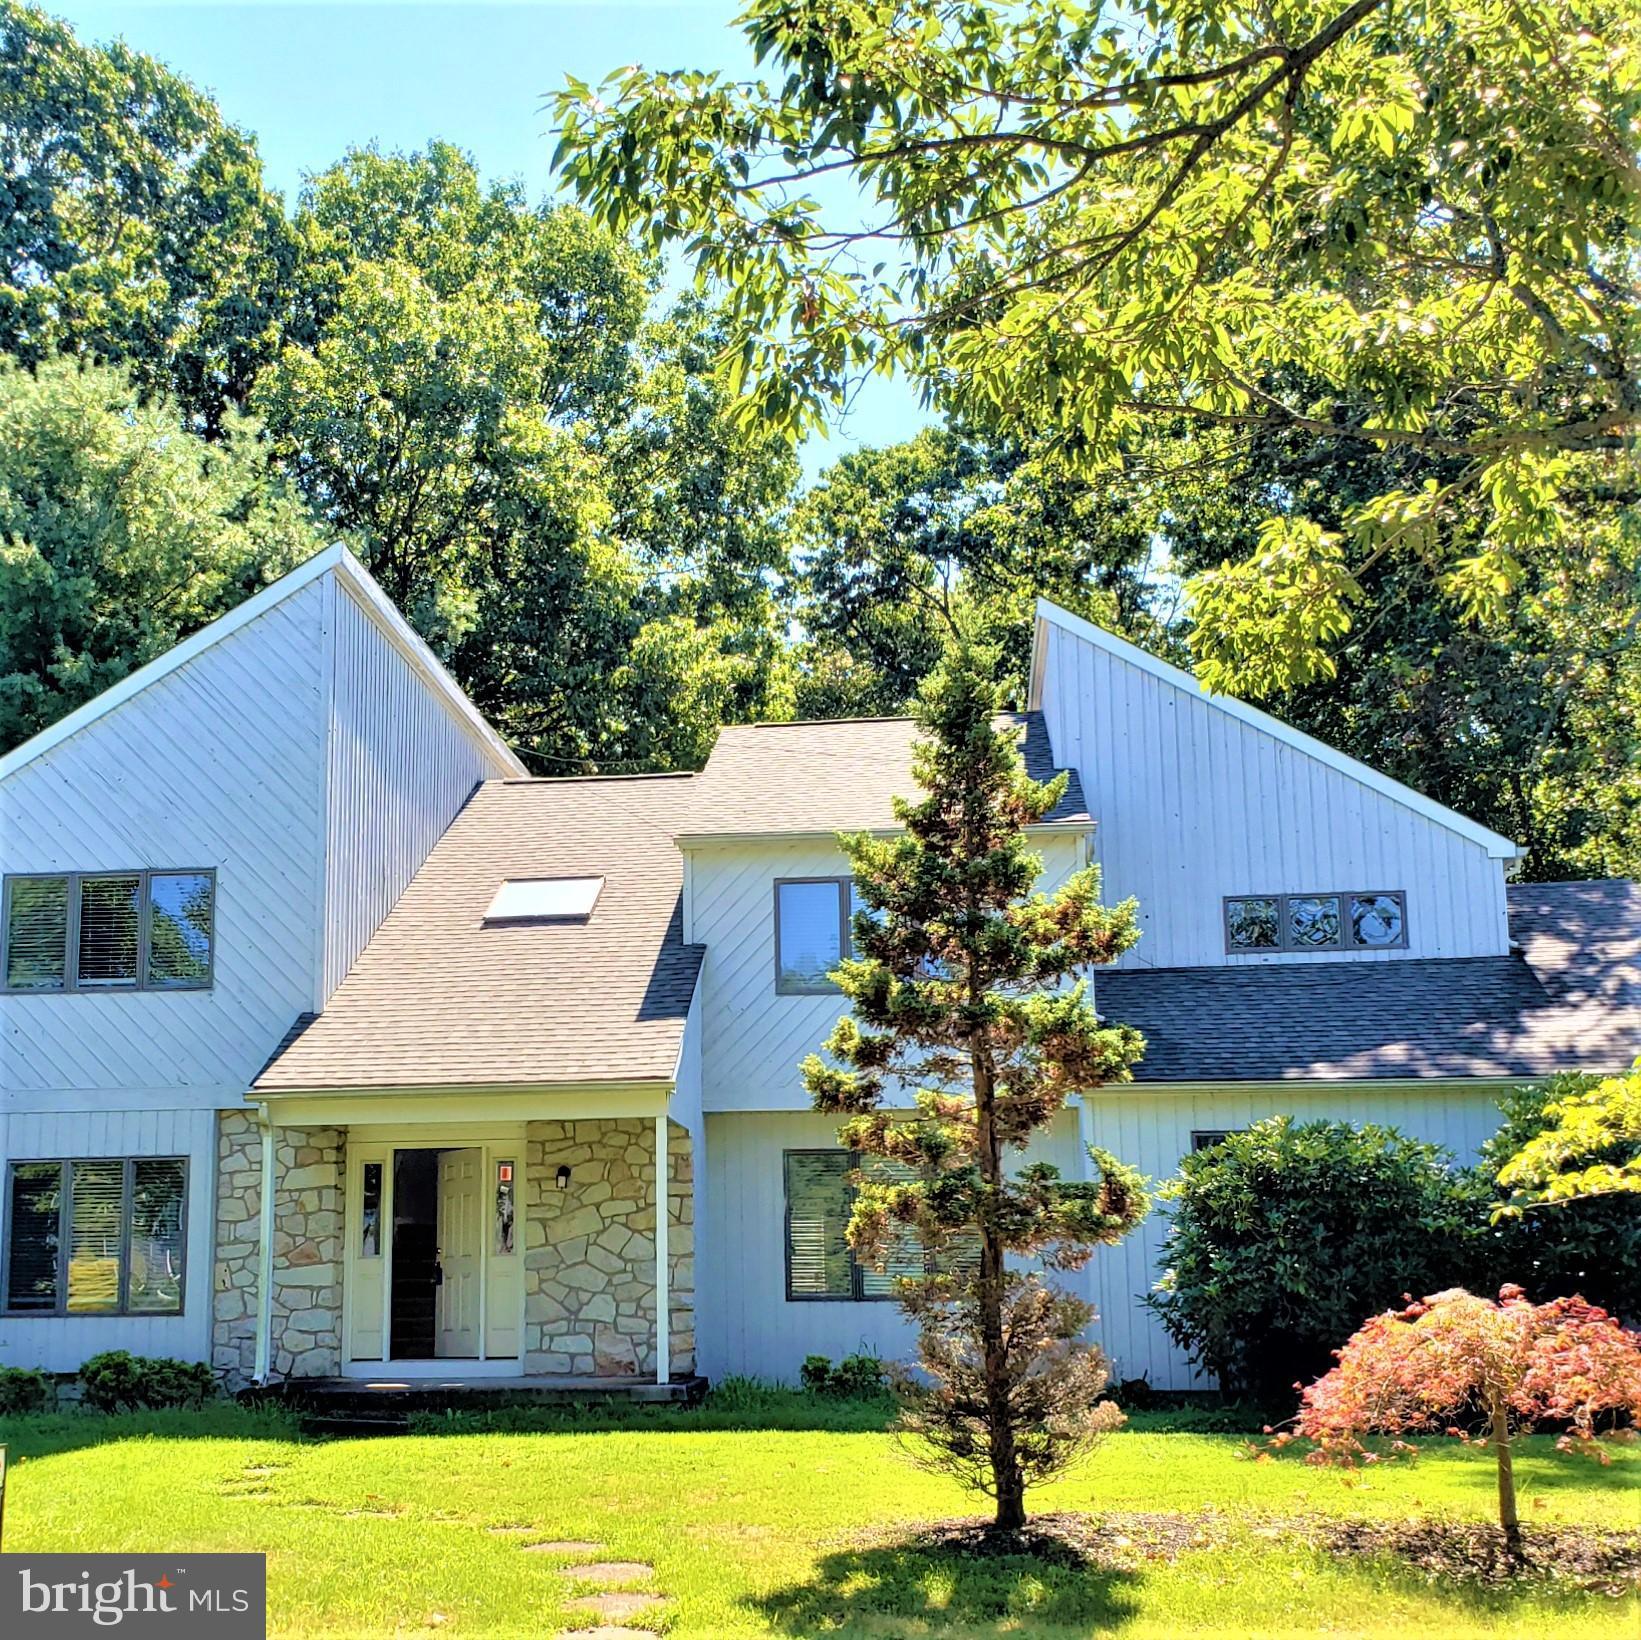 27 Remington Cir, Princeton Junction, NJ, 08550